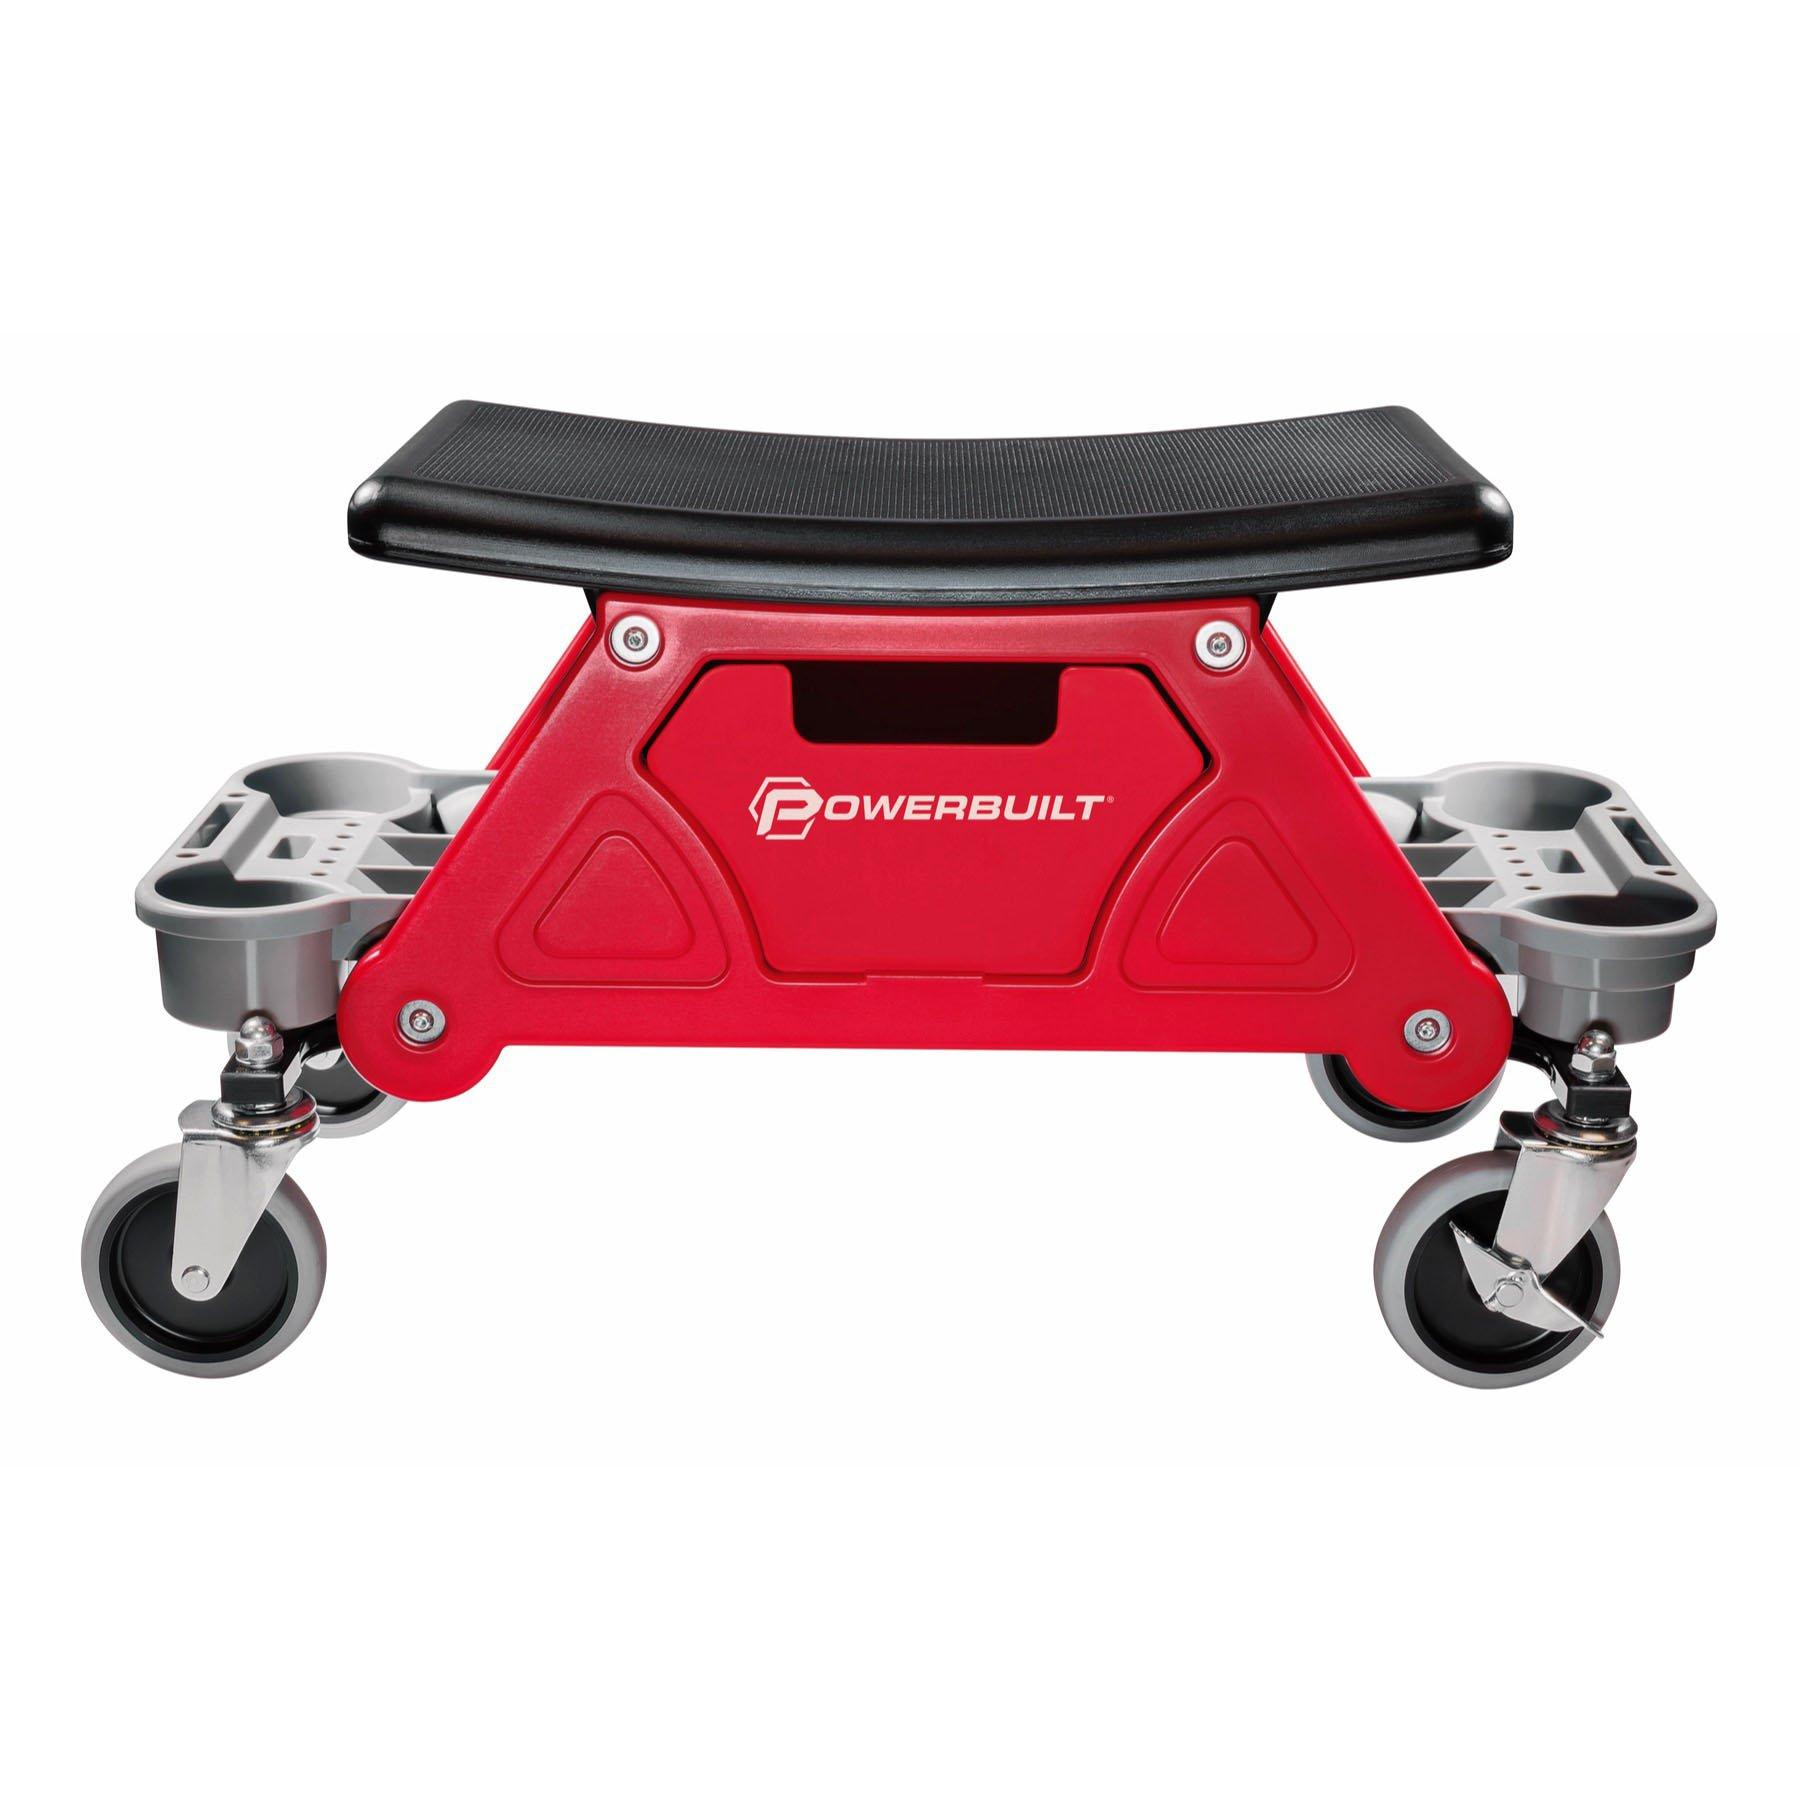 Powerbuilt Heavy Duty Rolling Mechanics Seat Brake Stool 300lb Capacity - 240036 (Stool) by Powerbuilt (Image #5)